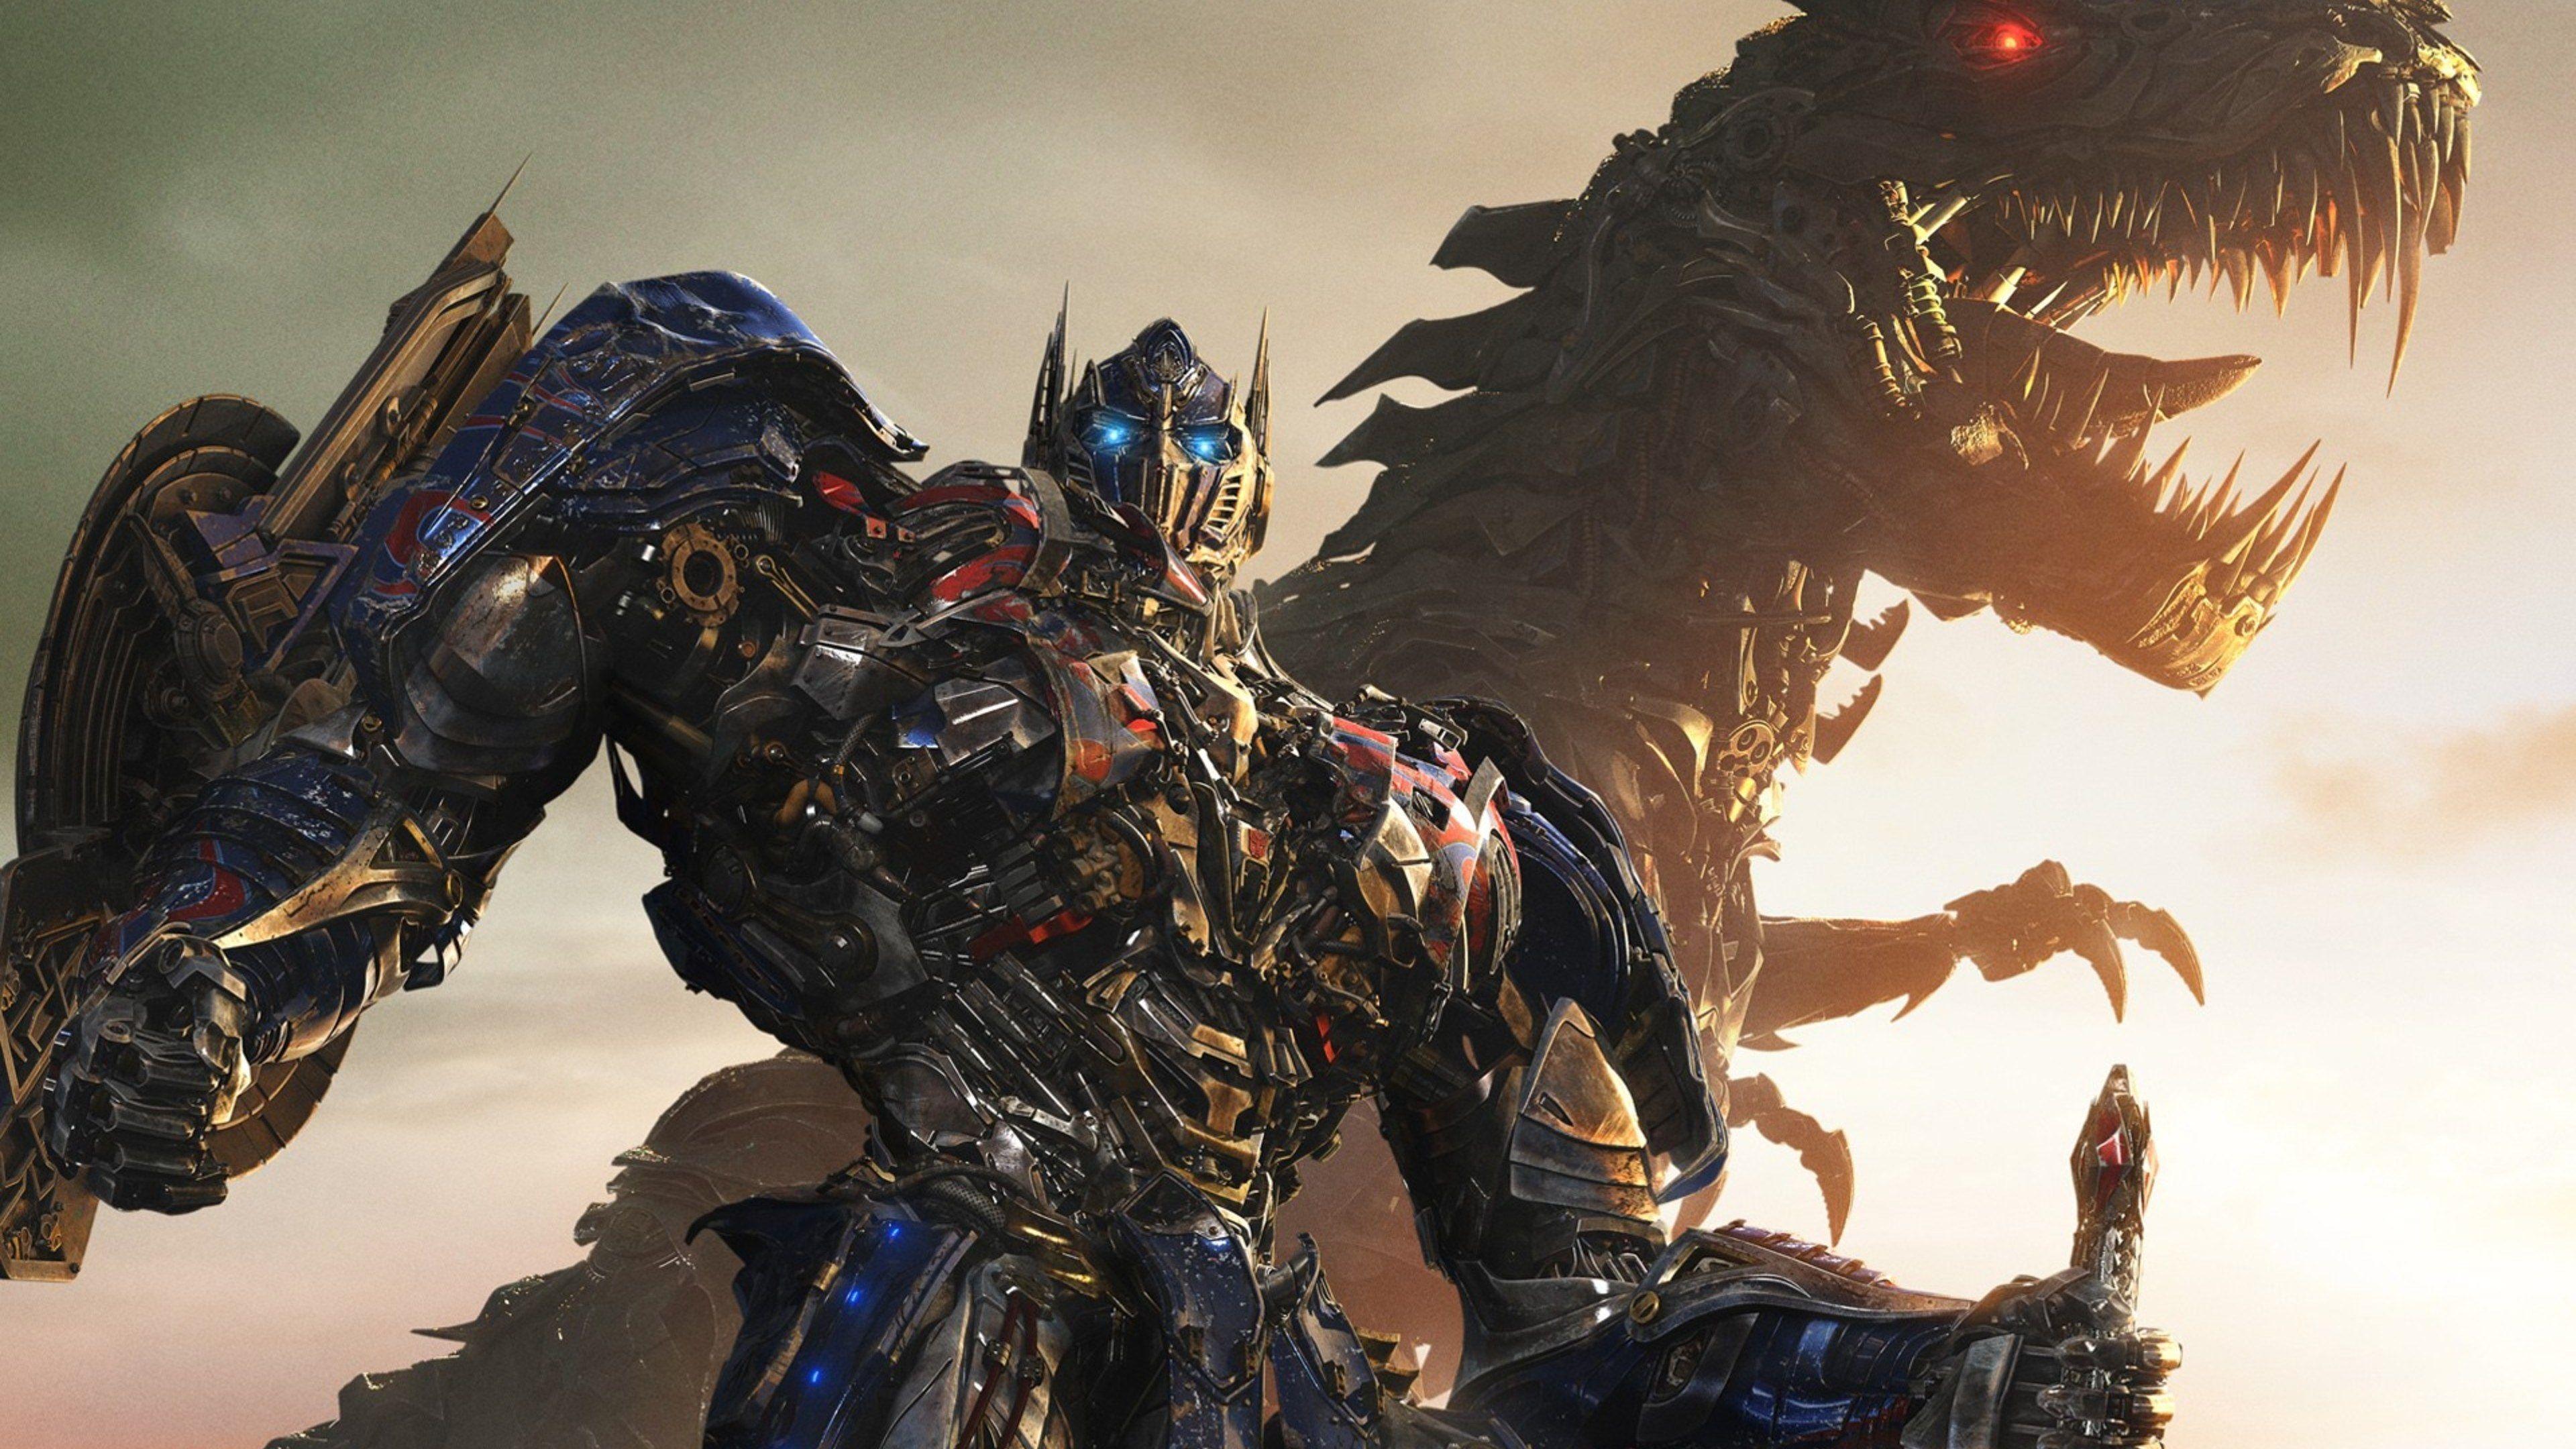 3840x2160 transformers 4k wallpaper hd pc Optimus prime